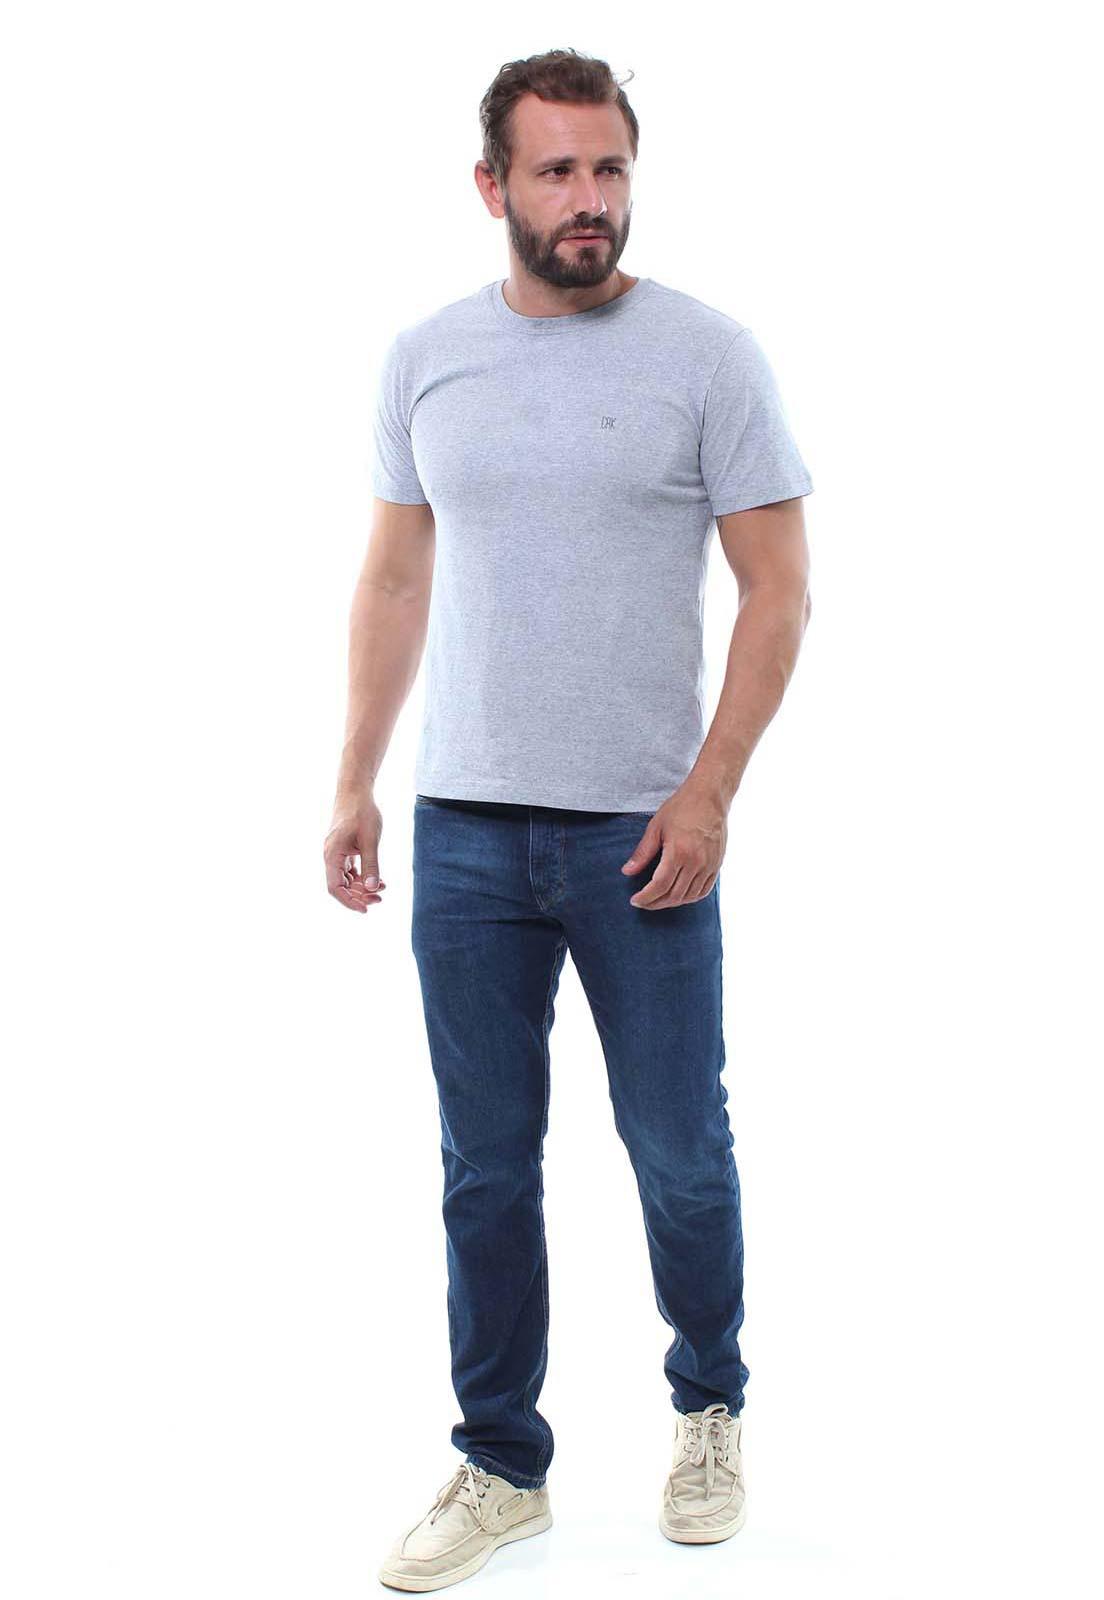 Camiseta Masculina Manga Curta Crocker - 48052  - CROCKER JEANS